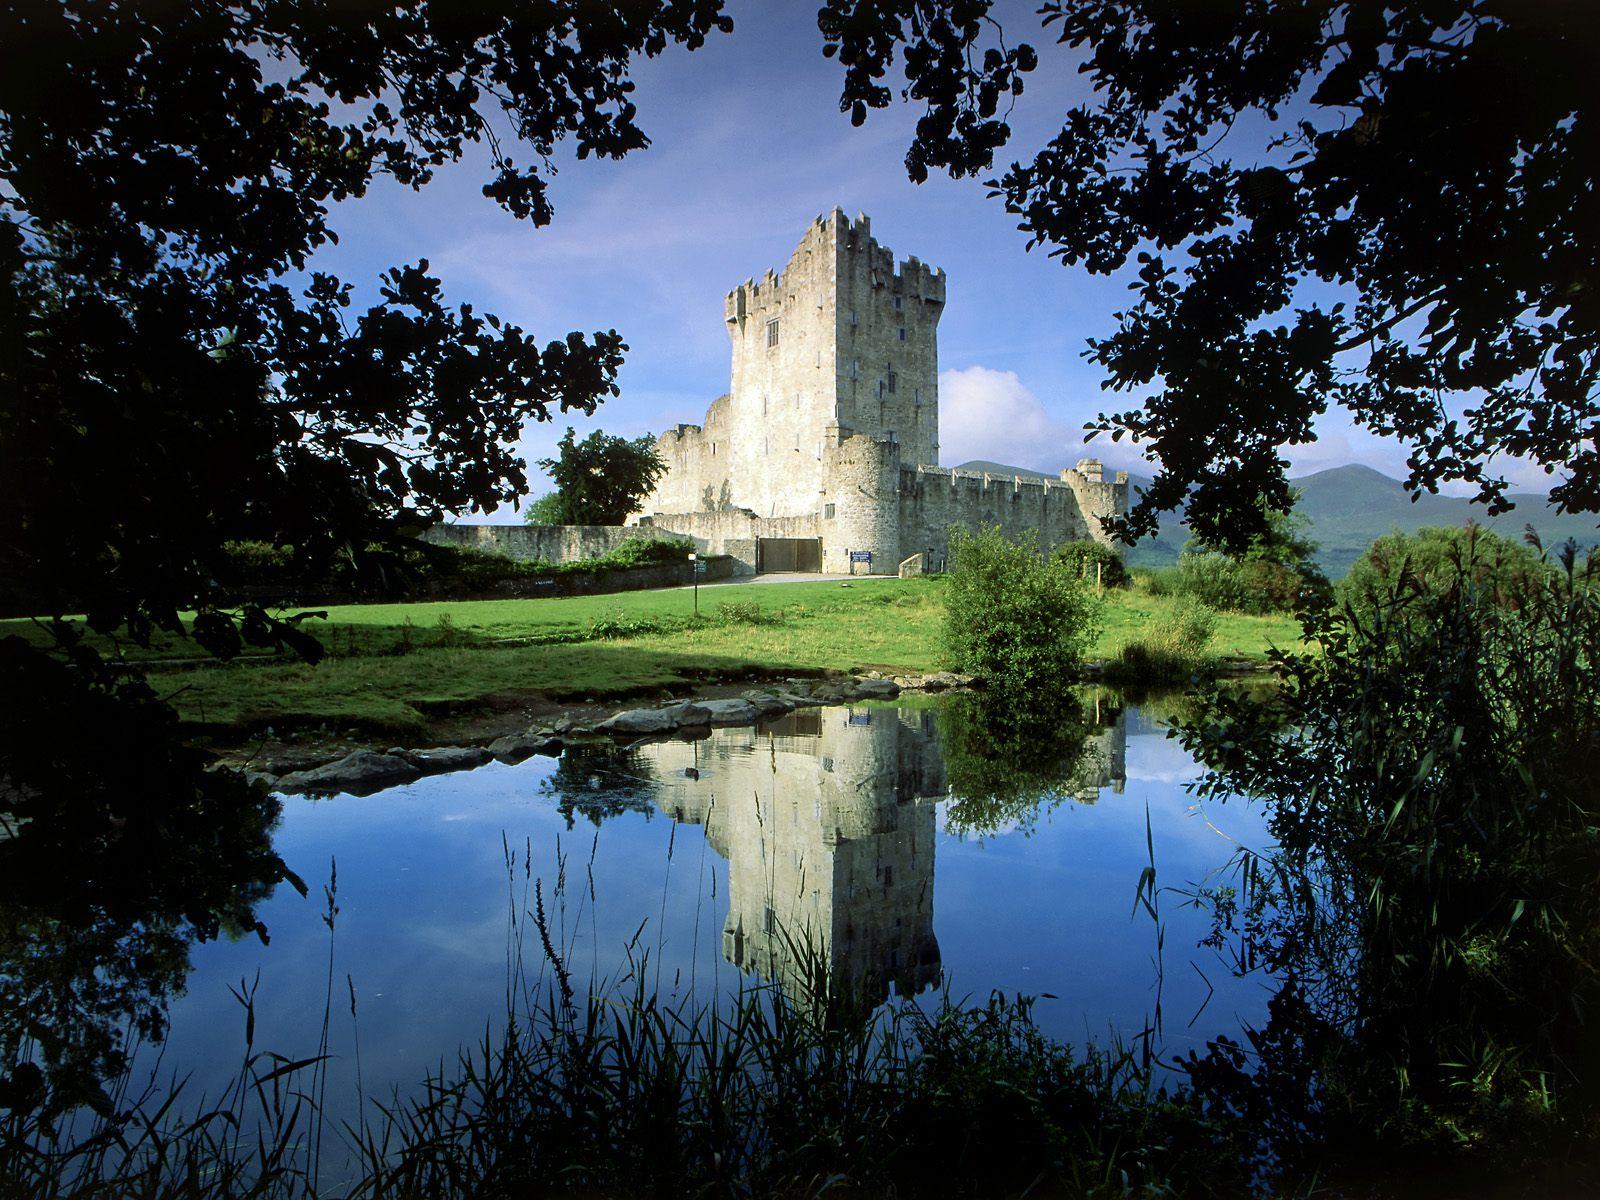 Irish Wallpapers ★ Lovely Irish Castle Pictures to ... Ireland Castle Wallpaper